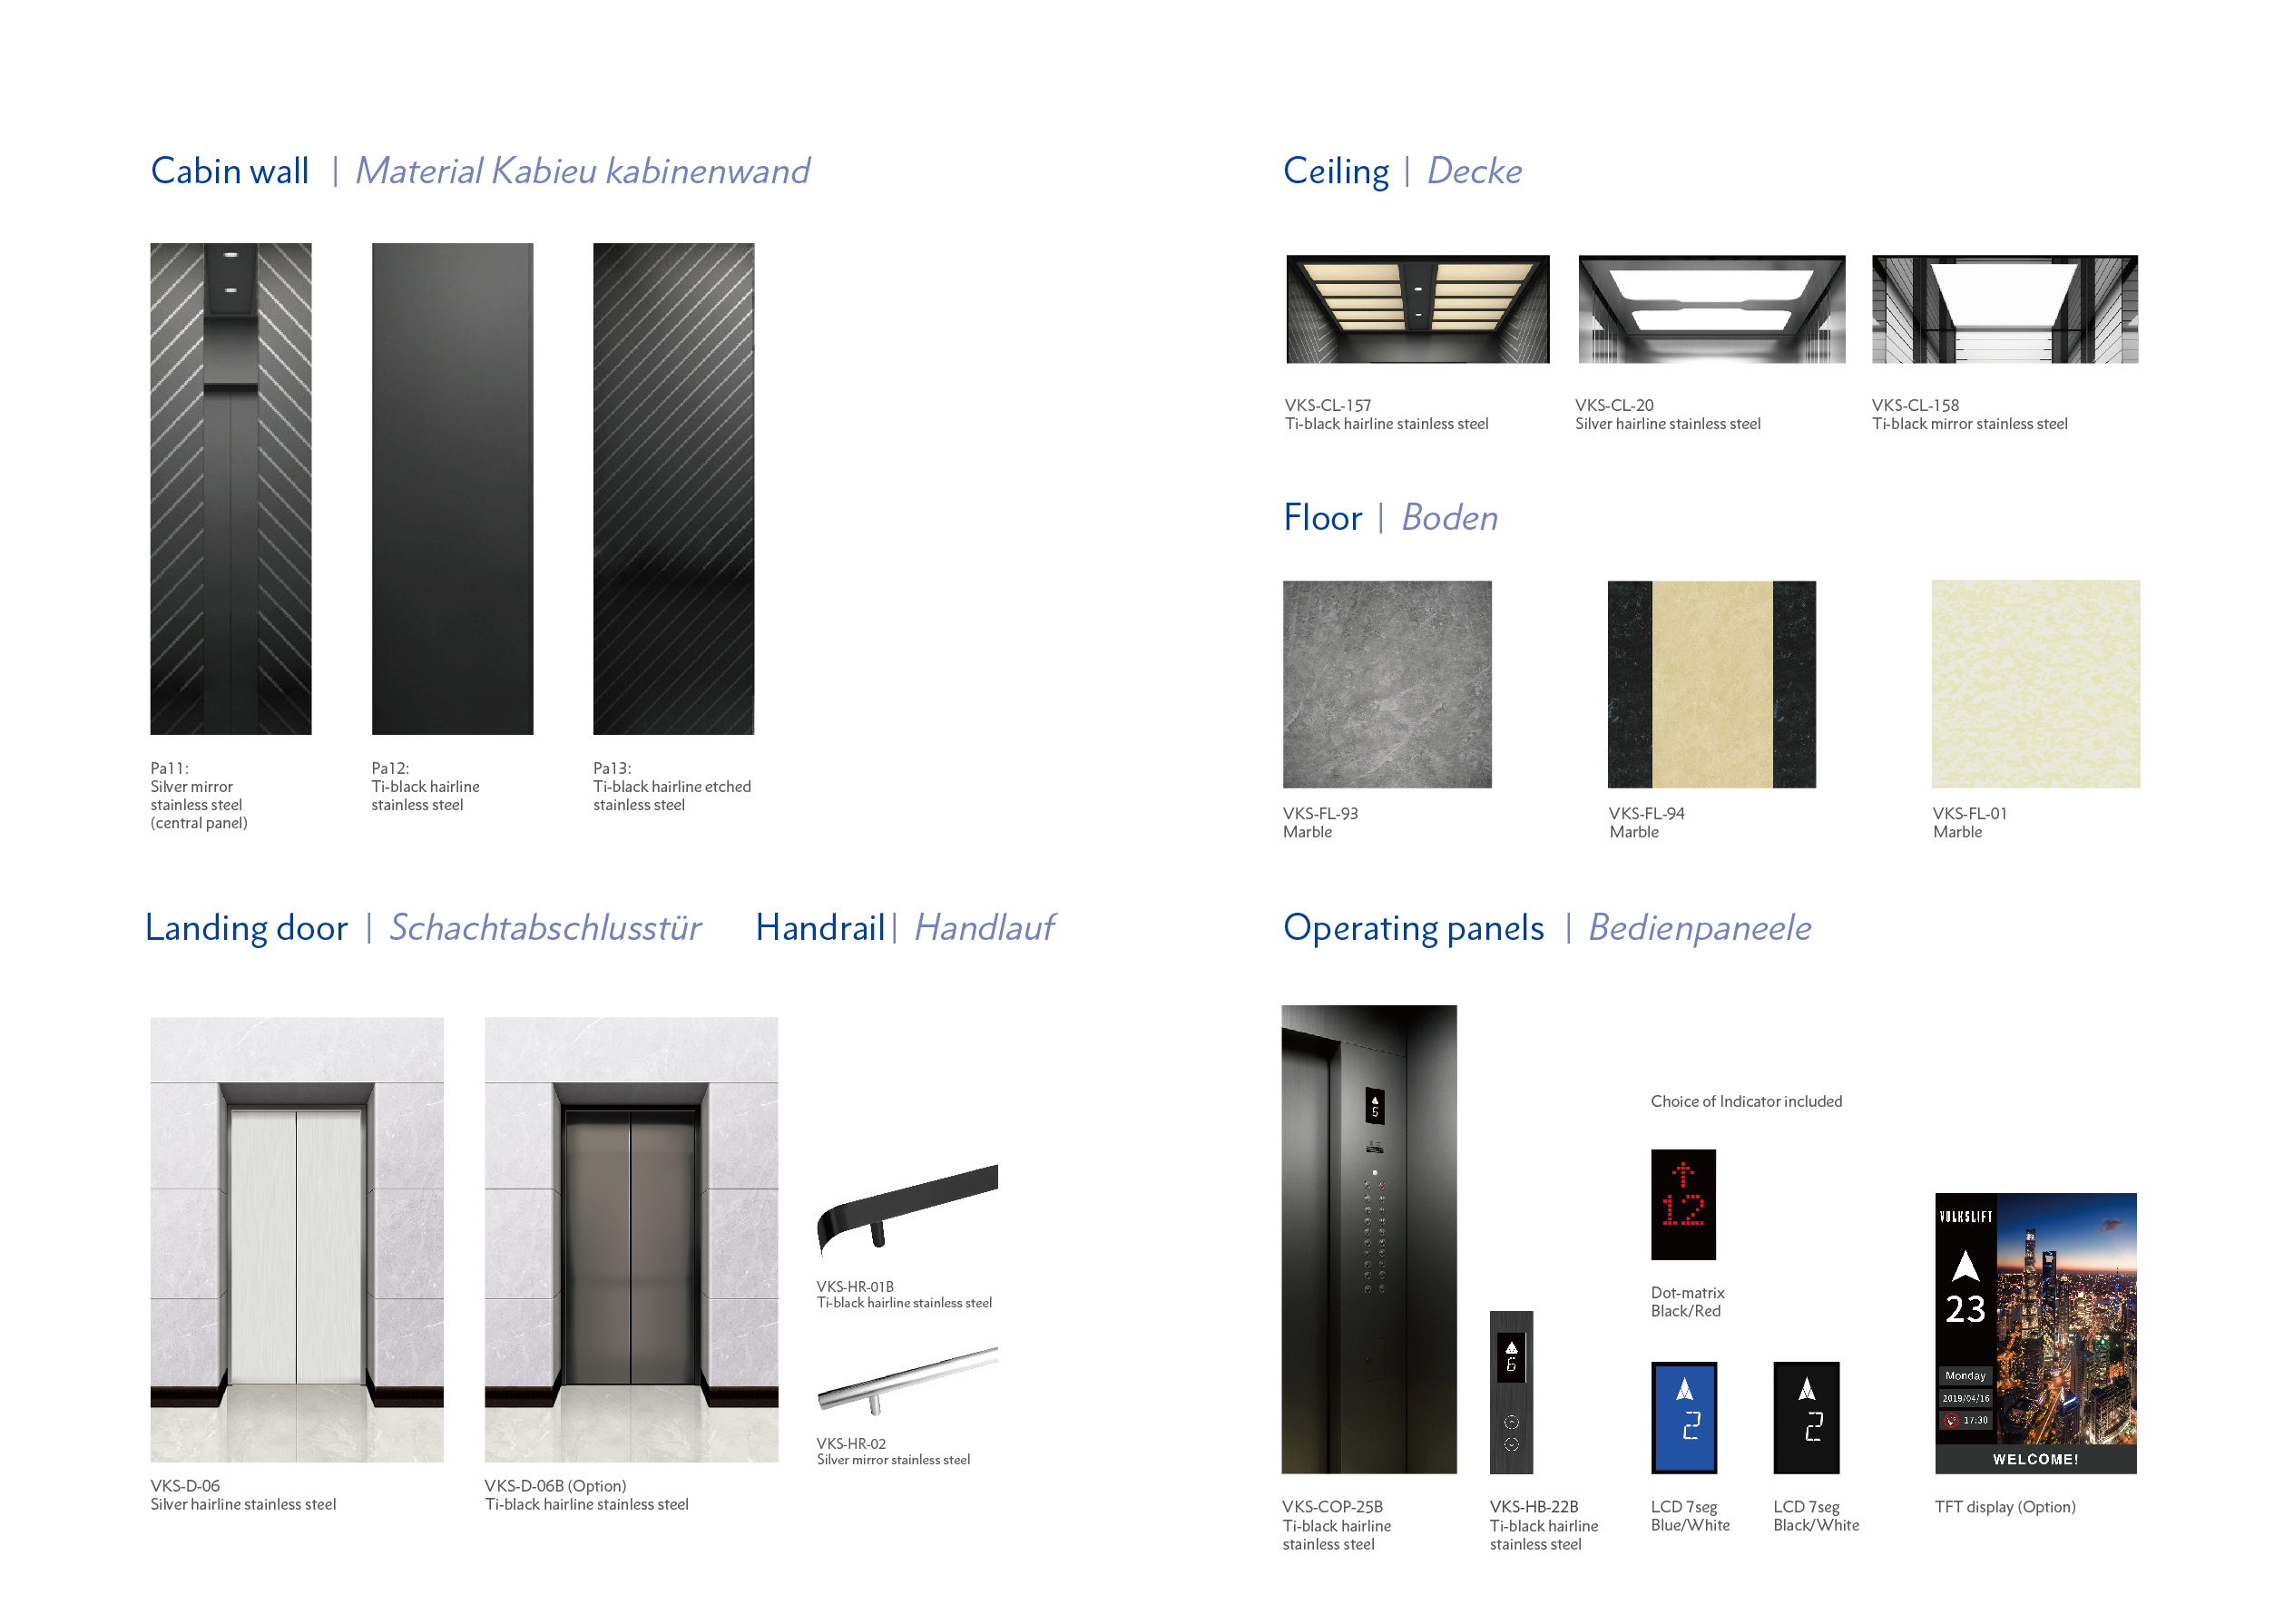 Matrix Elevator Design - Oryx Elevators